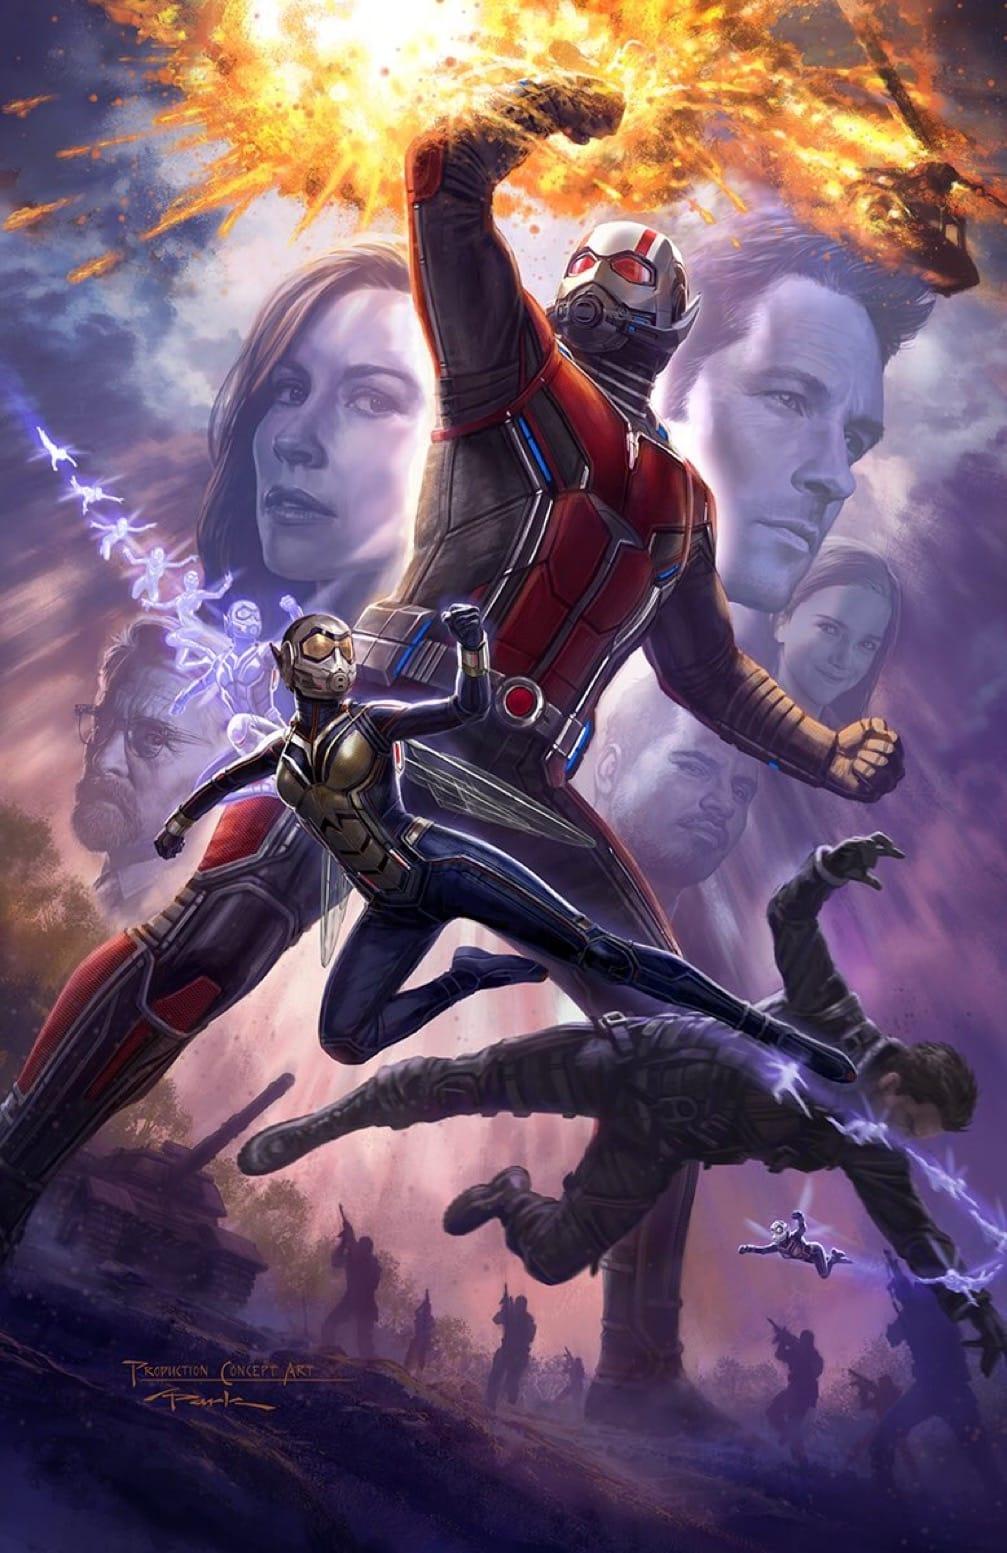 Plagát na Ant-Man & The Wasp z tohtoročného Comic-Conu!